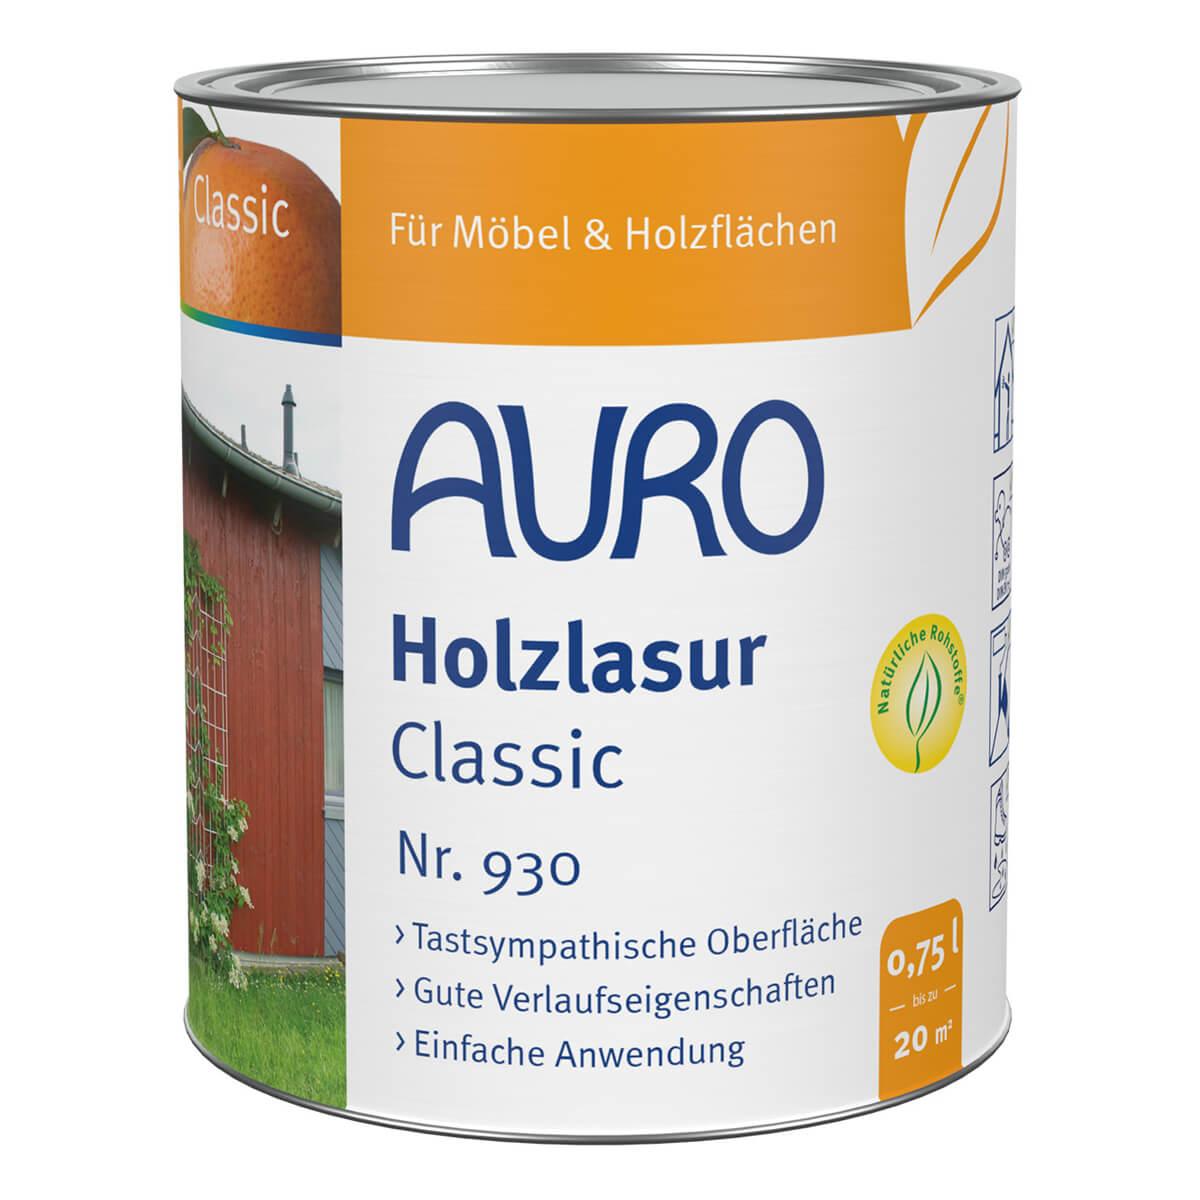 auro holzlasur classic nr 930 seidengl nzende lasur. Black Bedroom Furniture Sets. Home Design Ideas